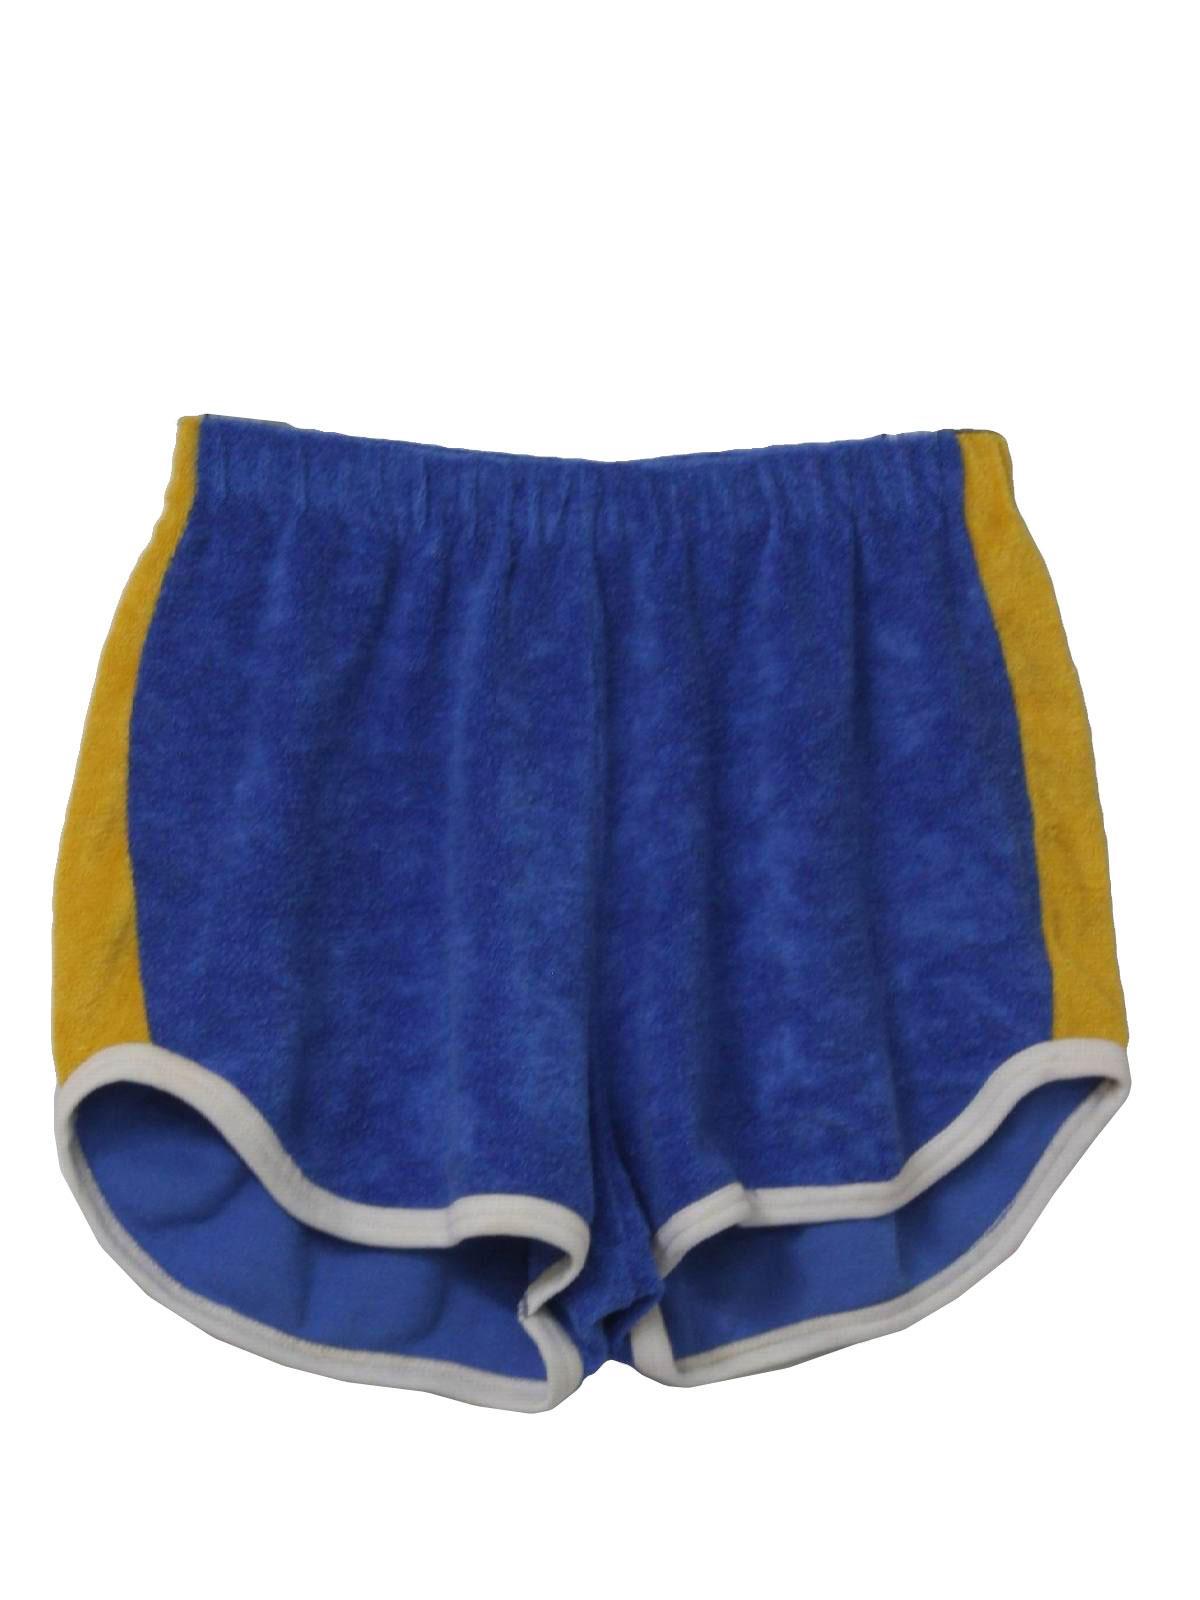 Retro 70s Shorts (Care Label) : 70s -Care Label- Mens royal blue ...